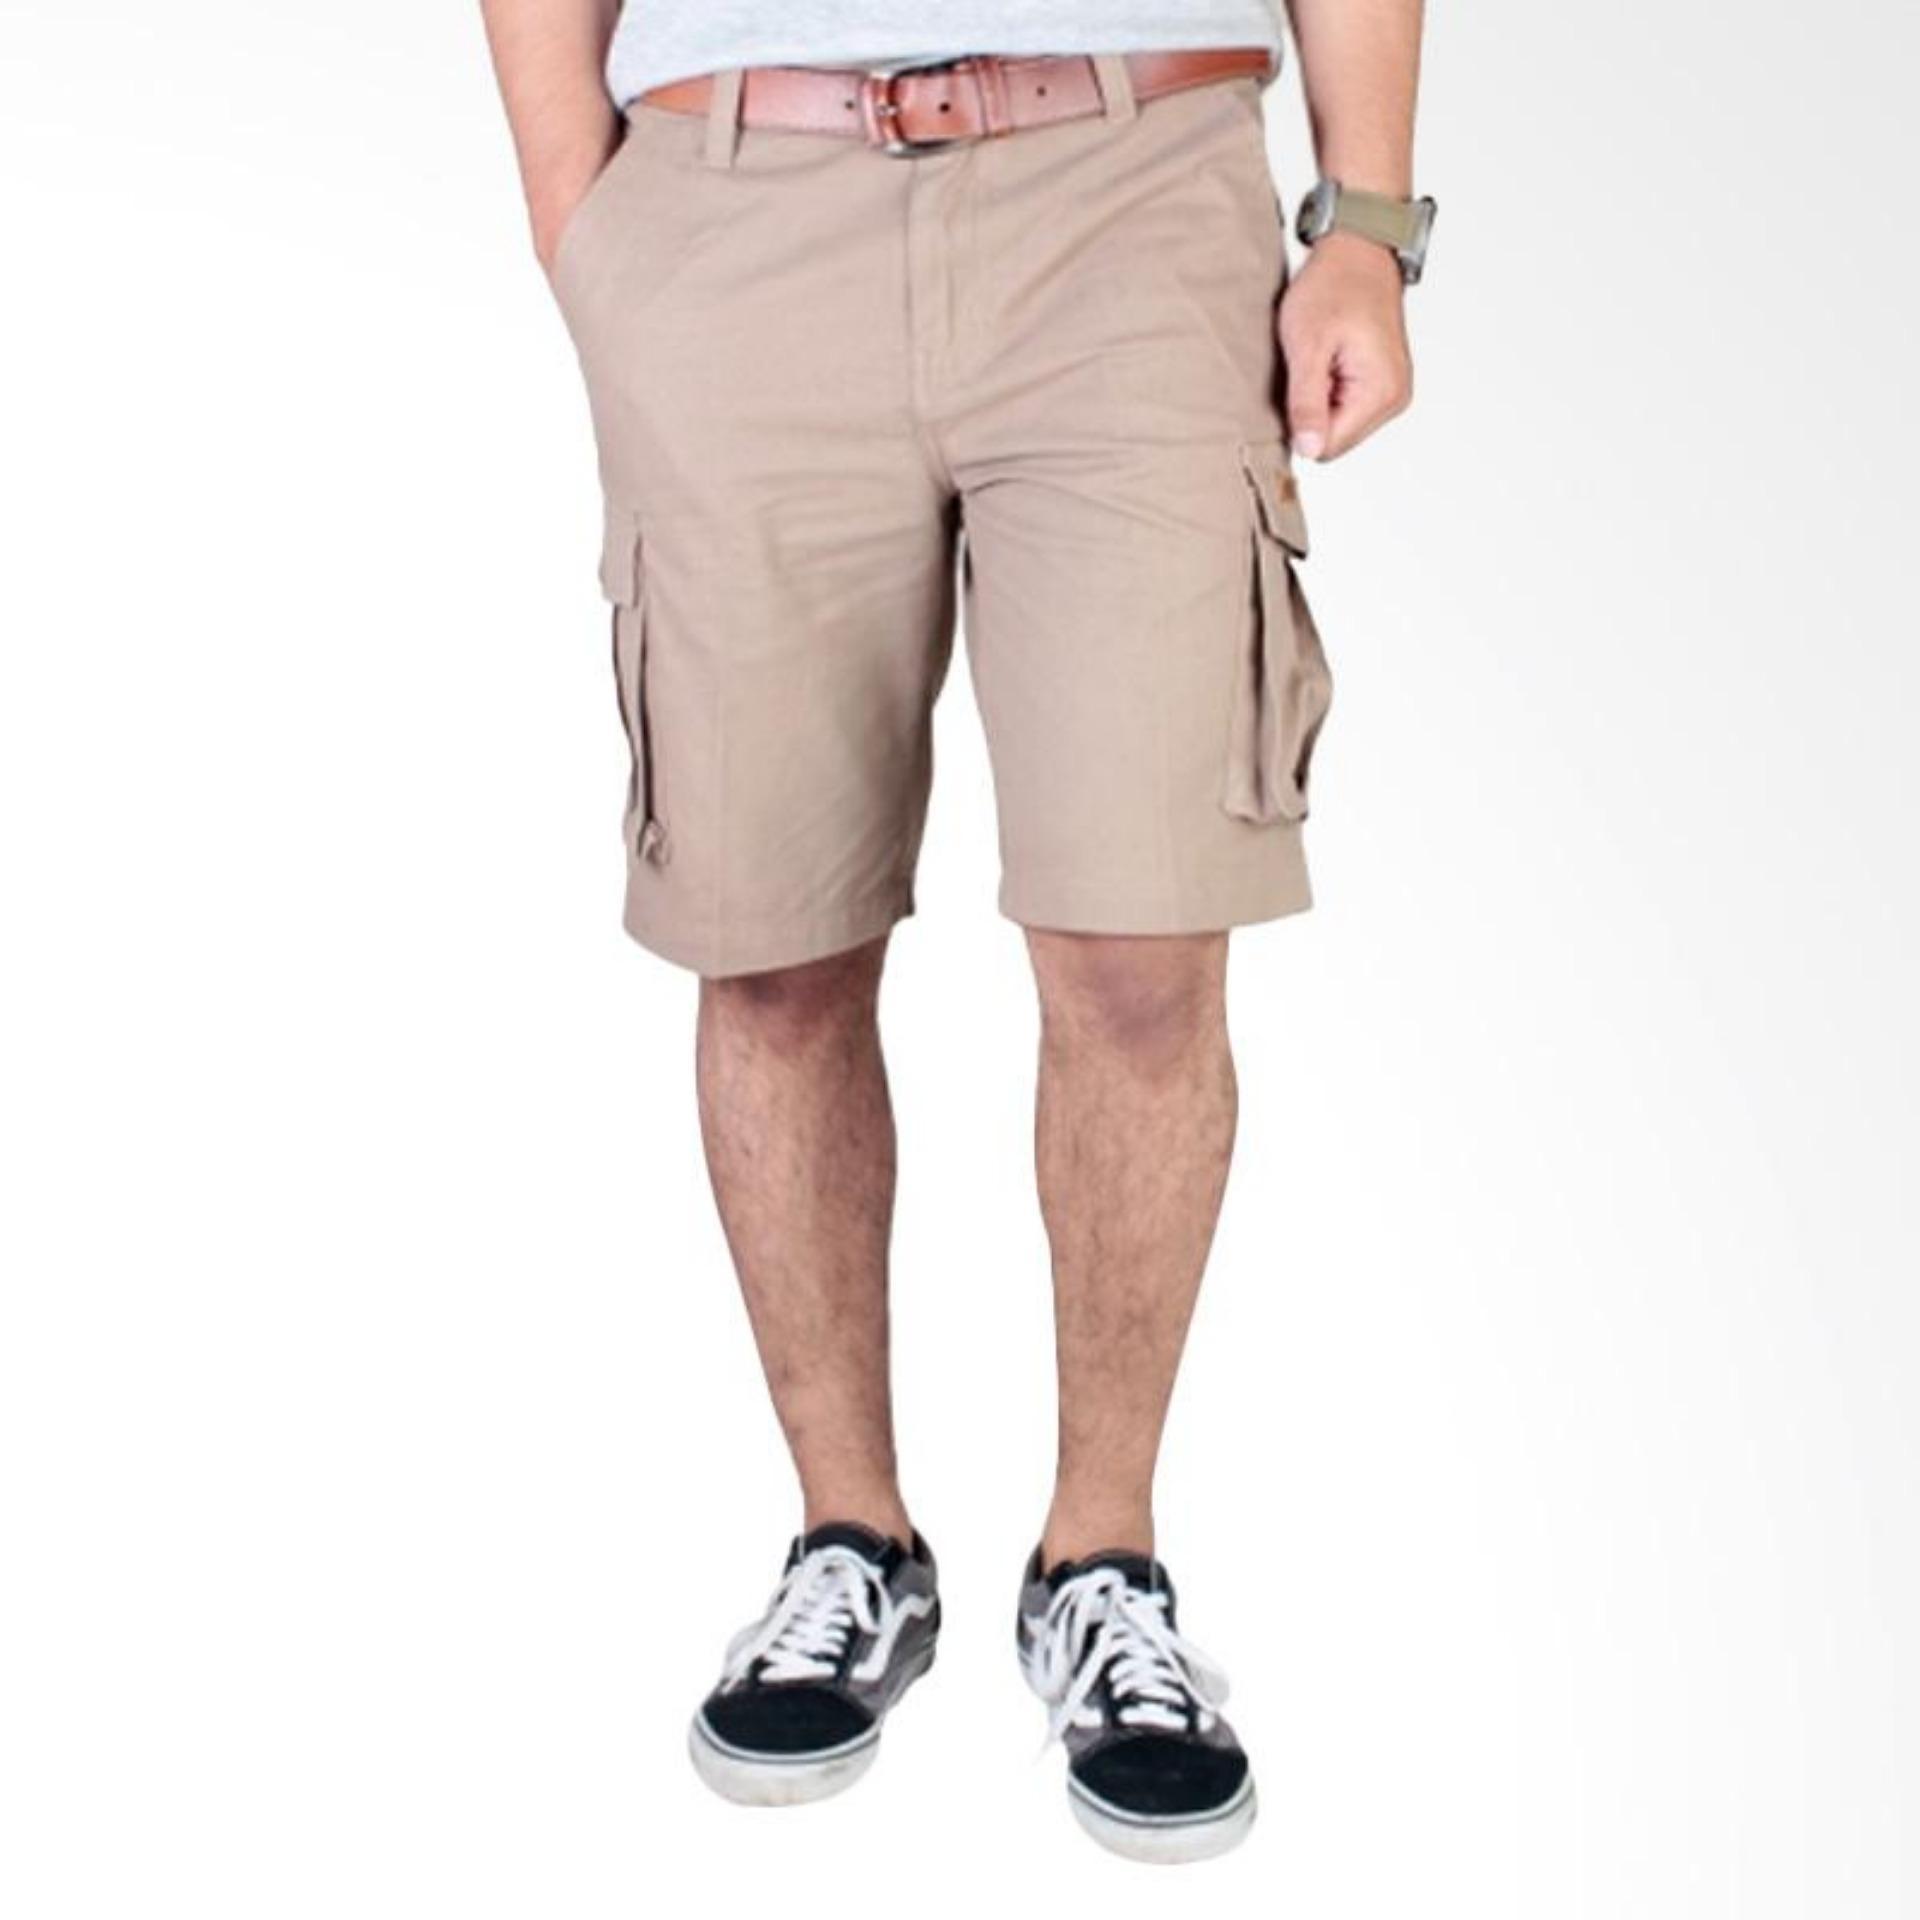 Promo Celana Cargo Pria Pendek Cream Akhir Tahun